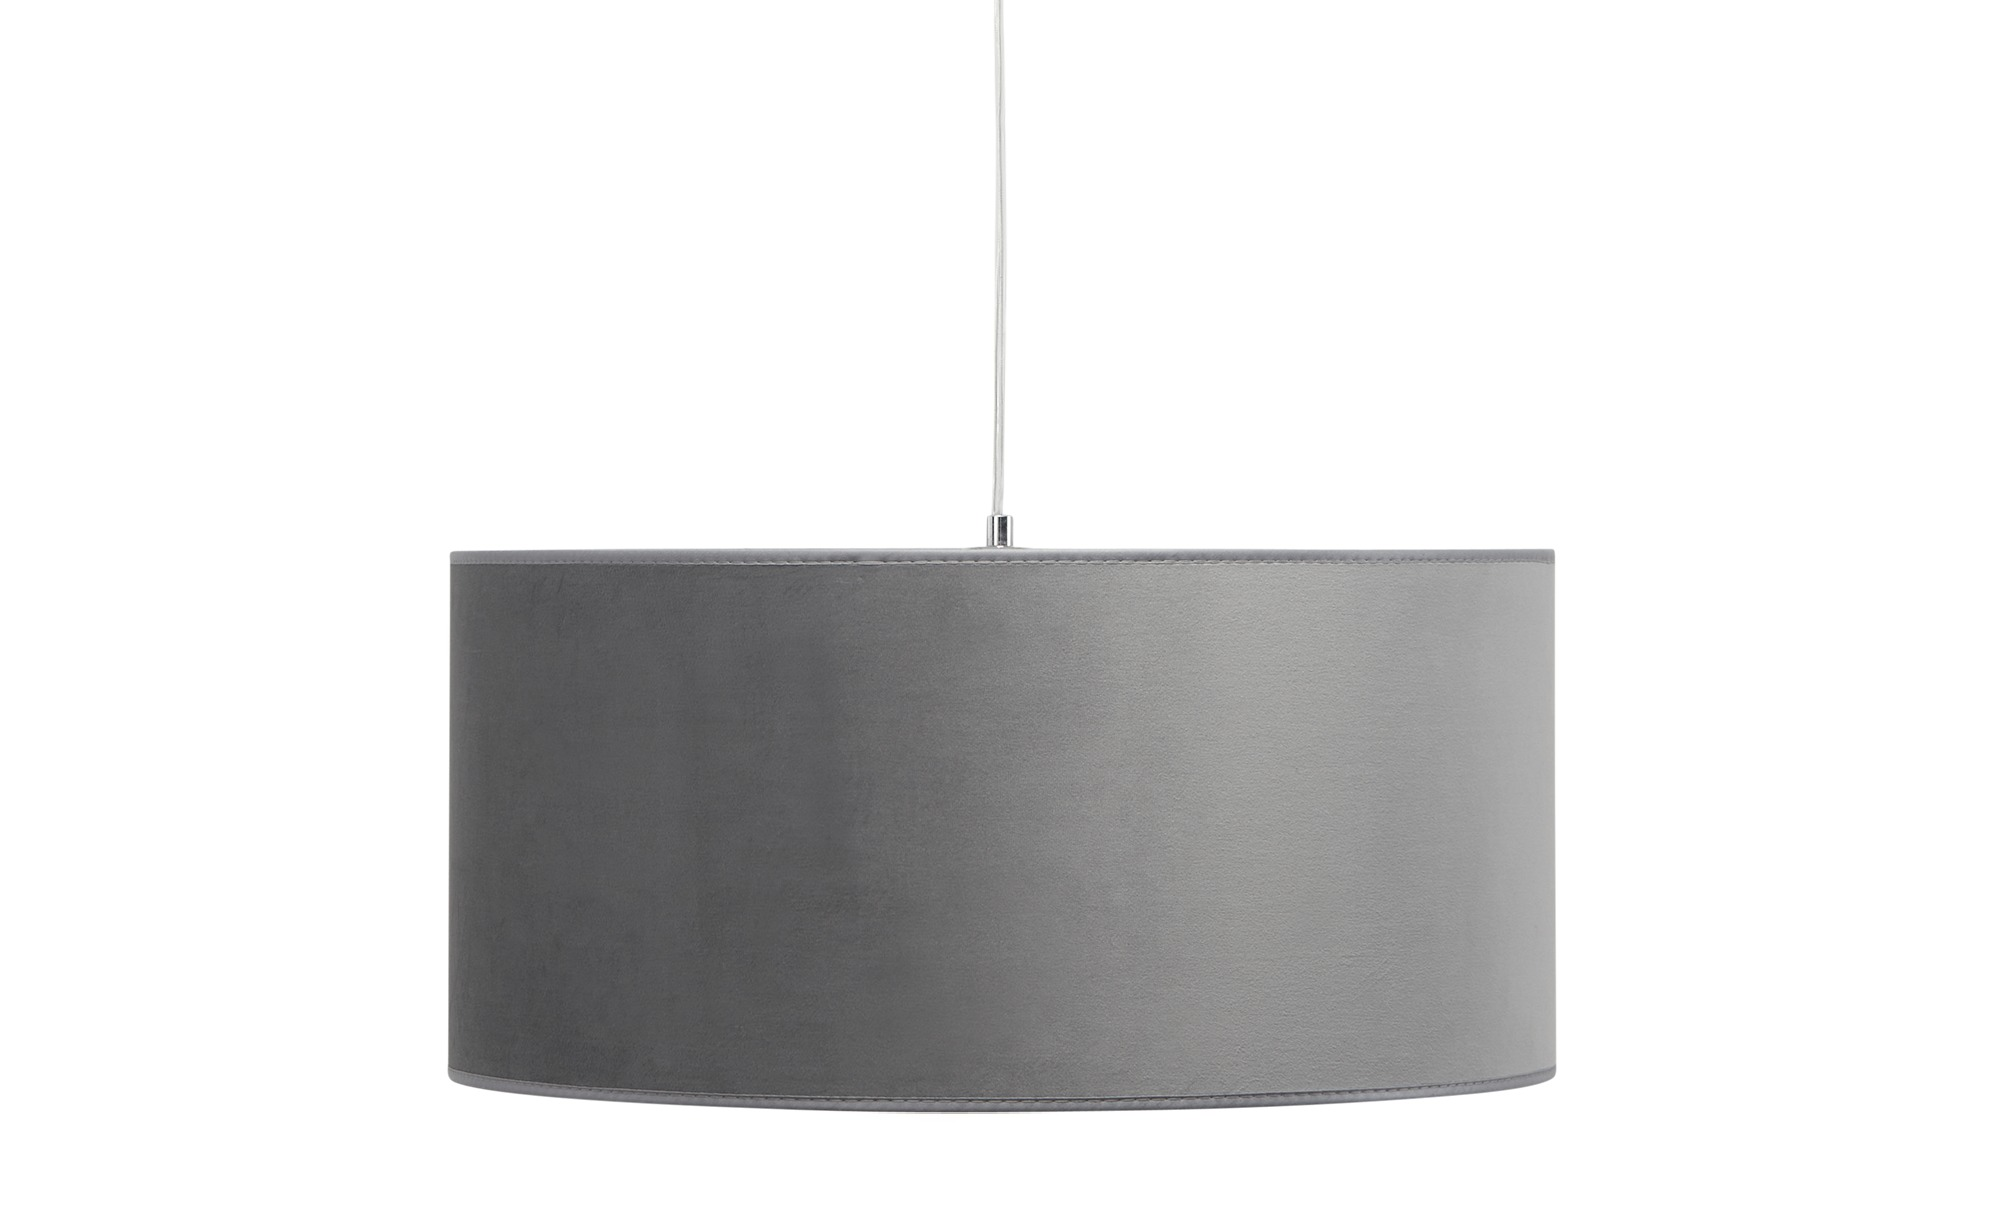 Pendelleuchte, 1-flammig, Samt grau ¦ grau ¦ Maße (cm): H: 24 Ø: 50 Lampen & Leuchten > Innenleuchten > Pendelleuchten - Höffner